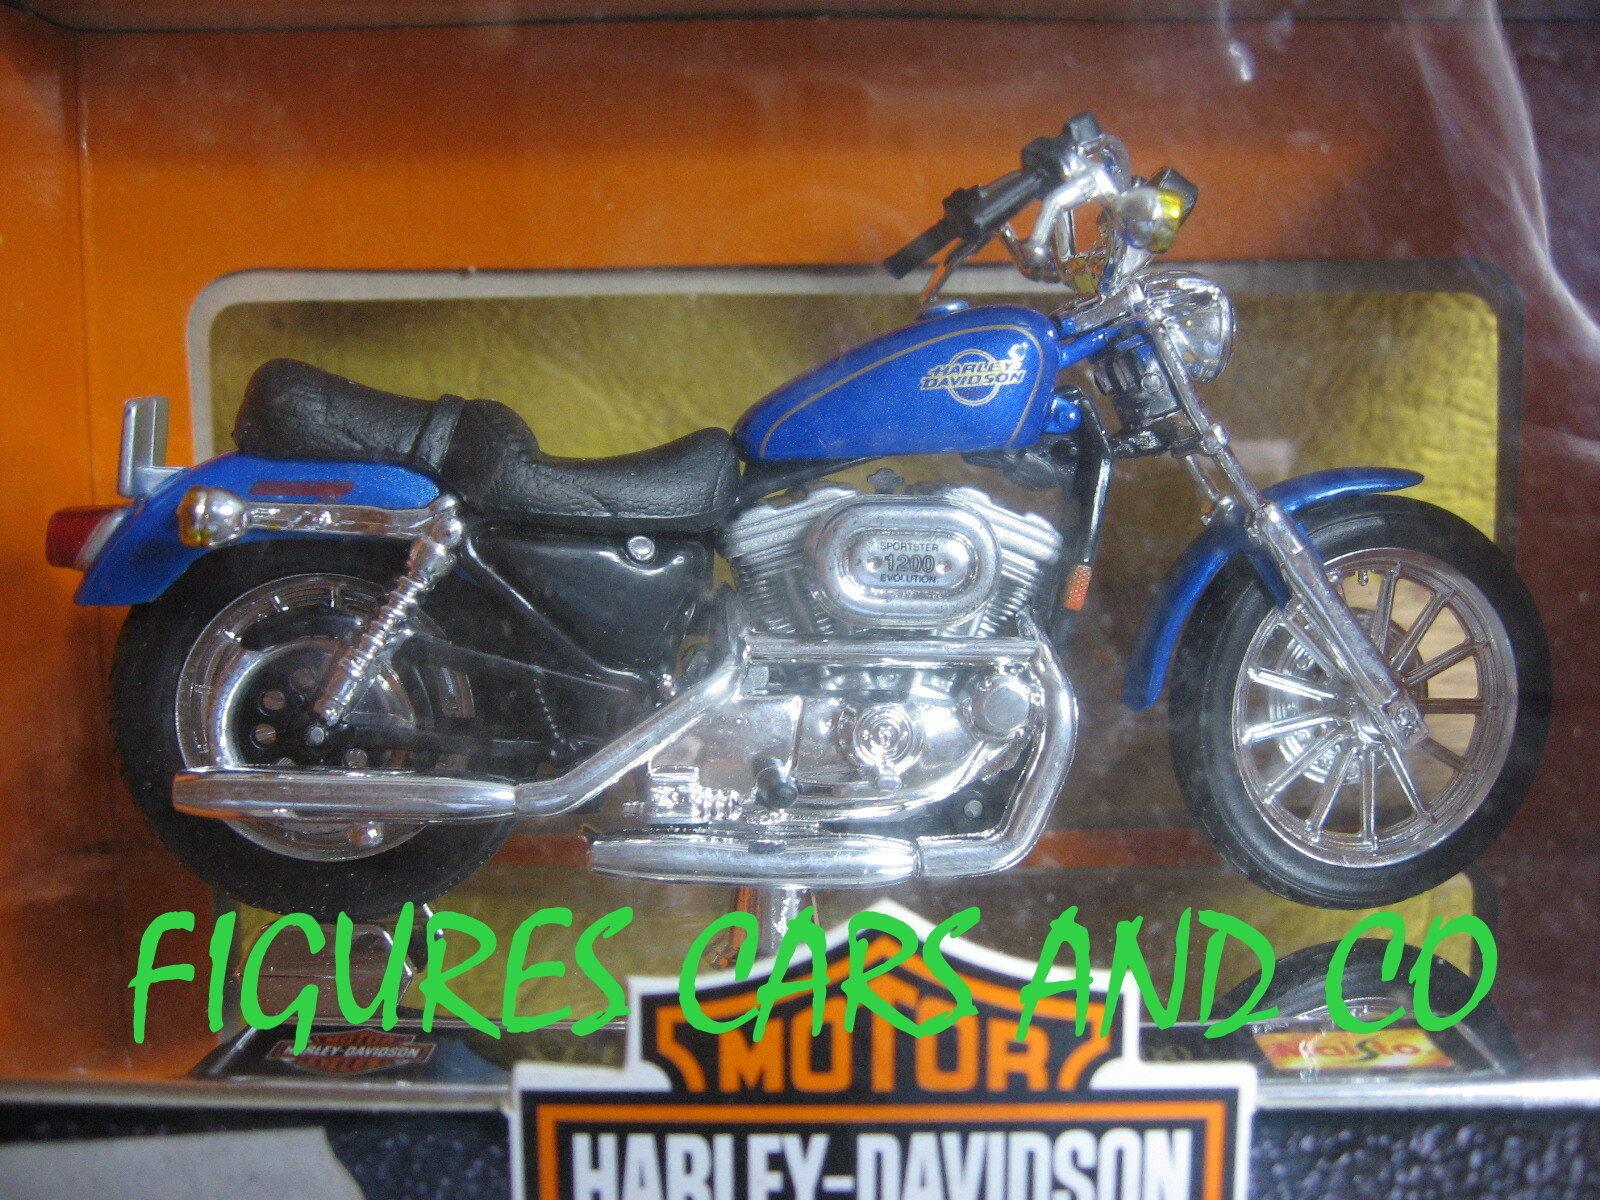 MOTO 1 18  HARLEY DAVIDSON XLH 1200 1200 1200 SPORTSTER BOITE MAISTO  100% a estrenar con calidad original.